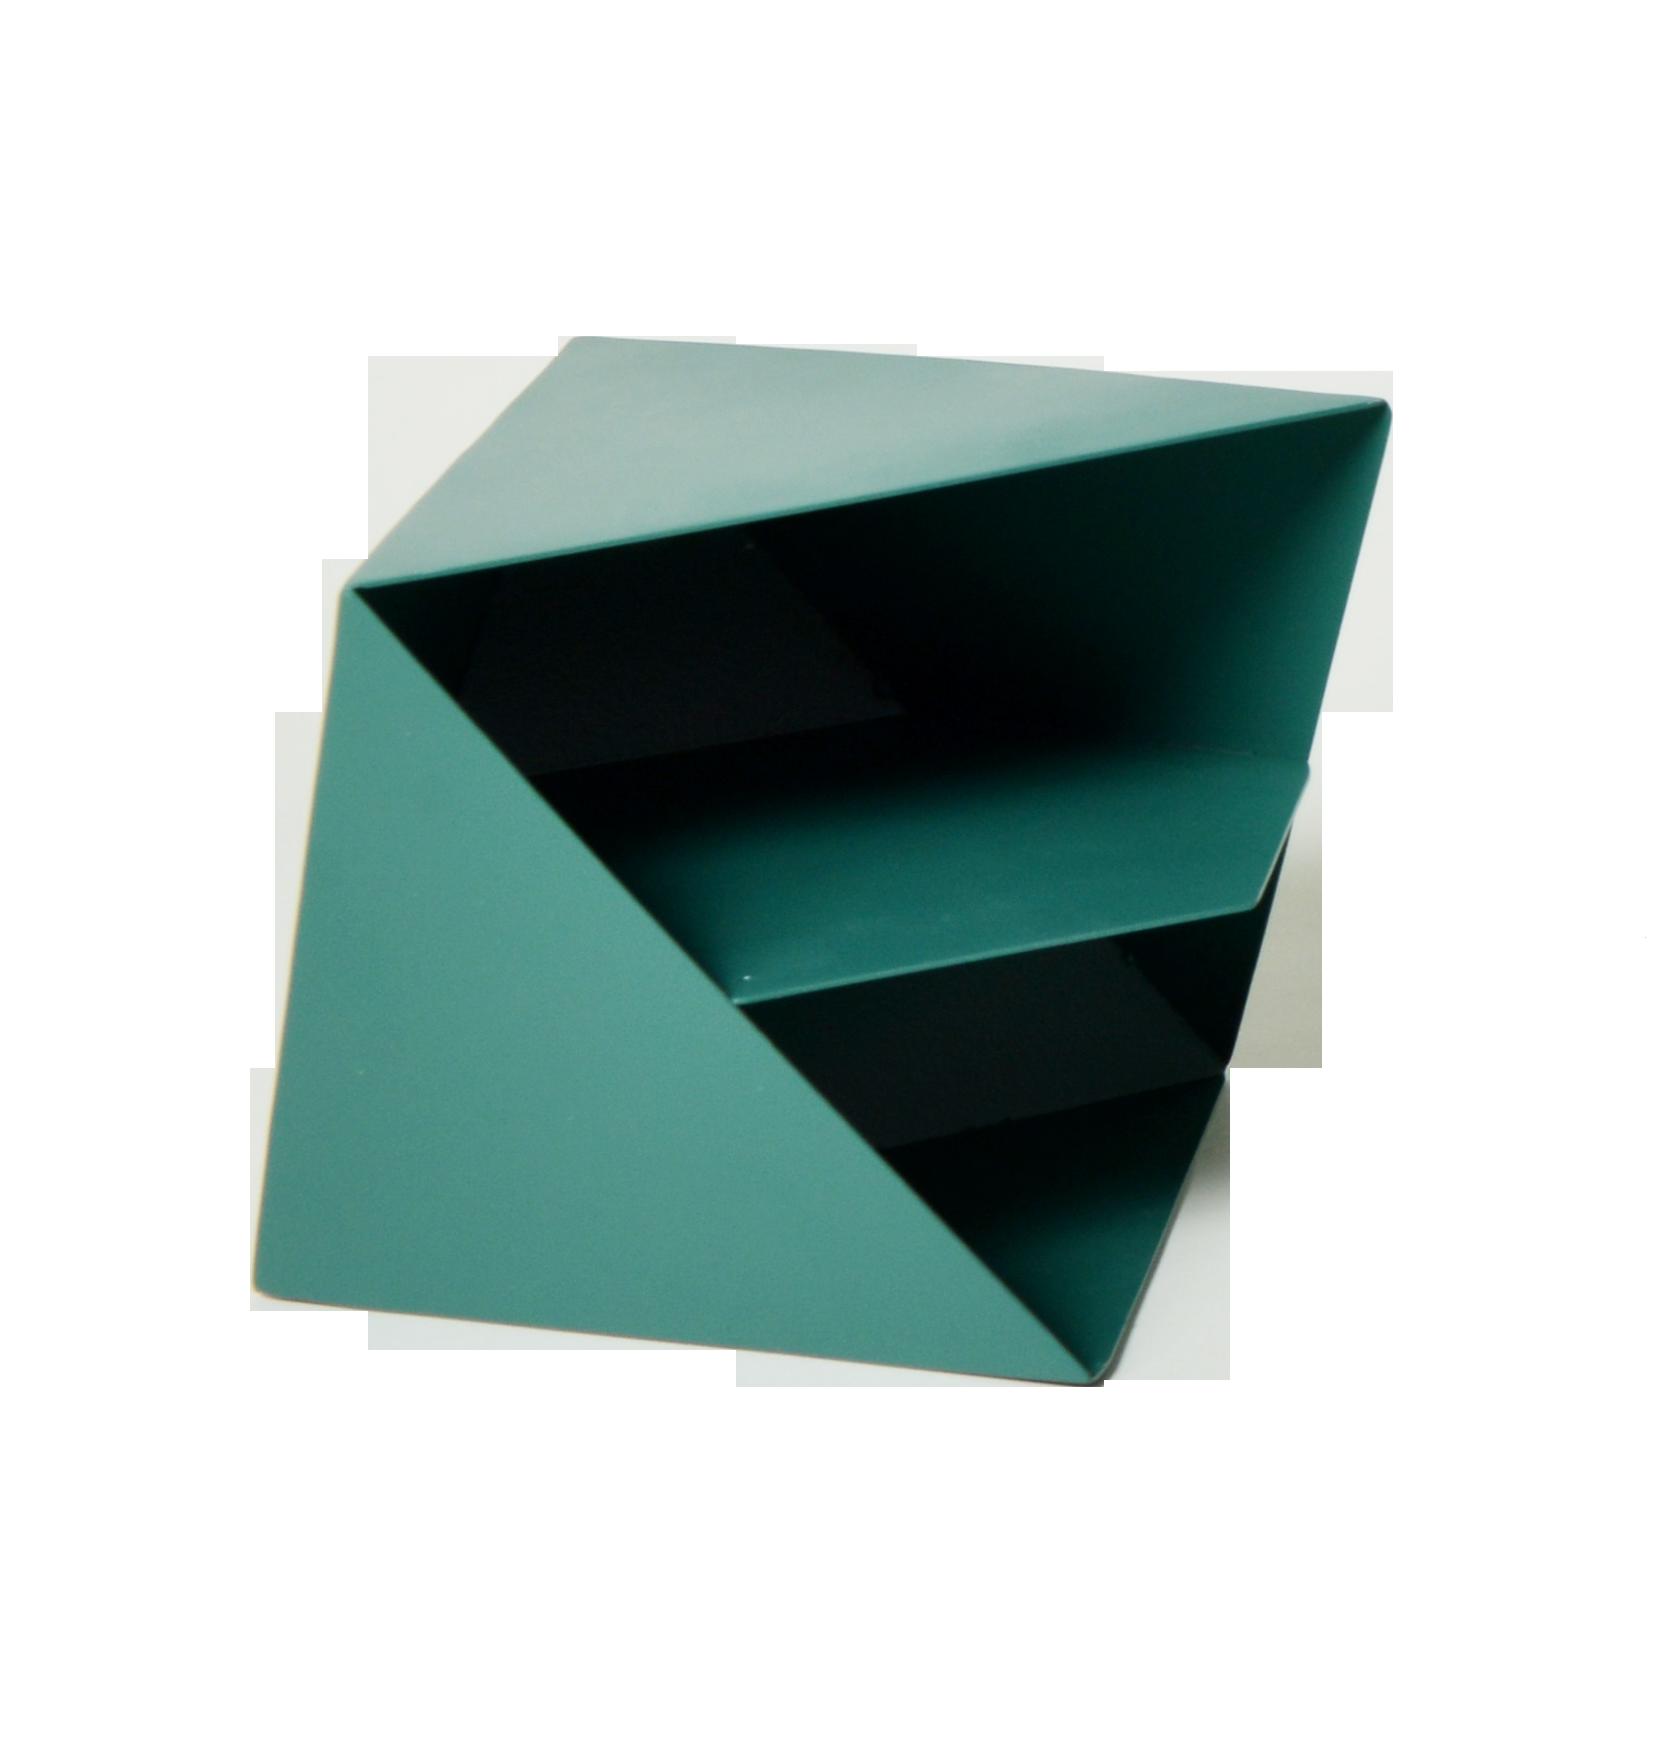 mudalla box-emnastudio